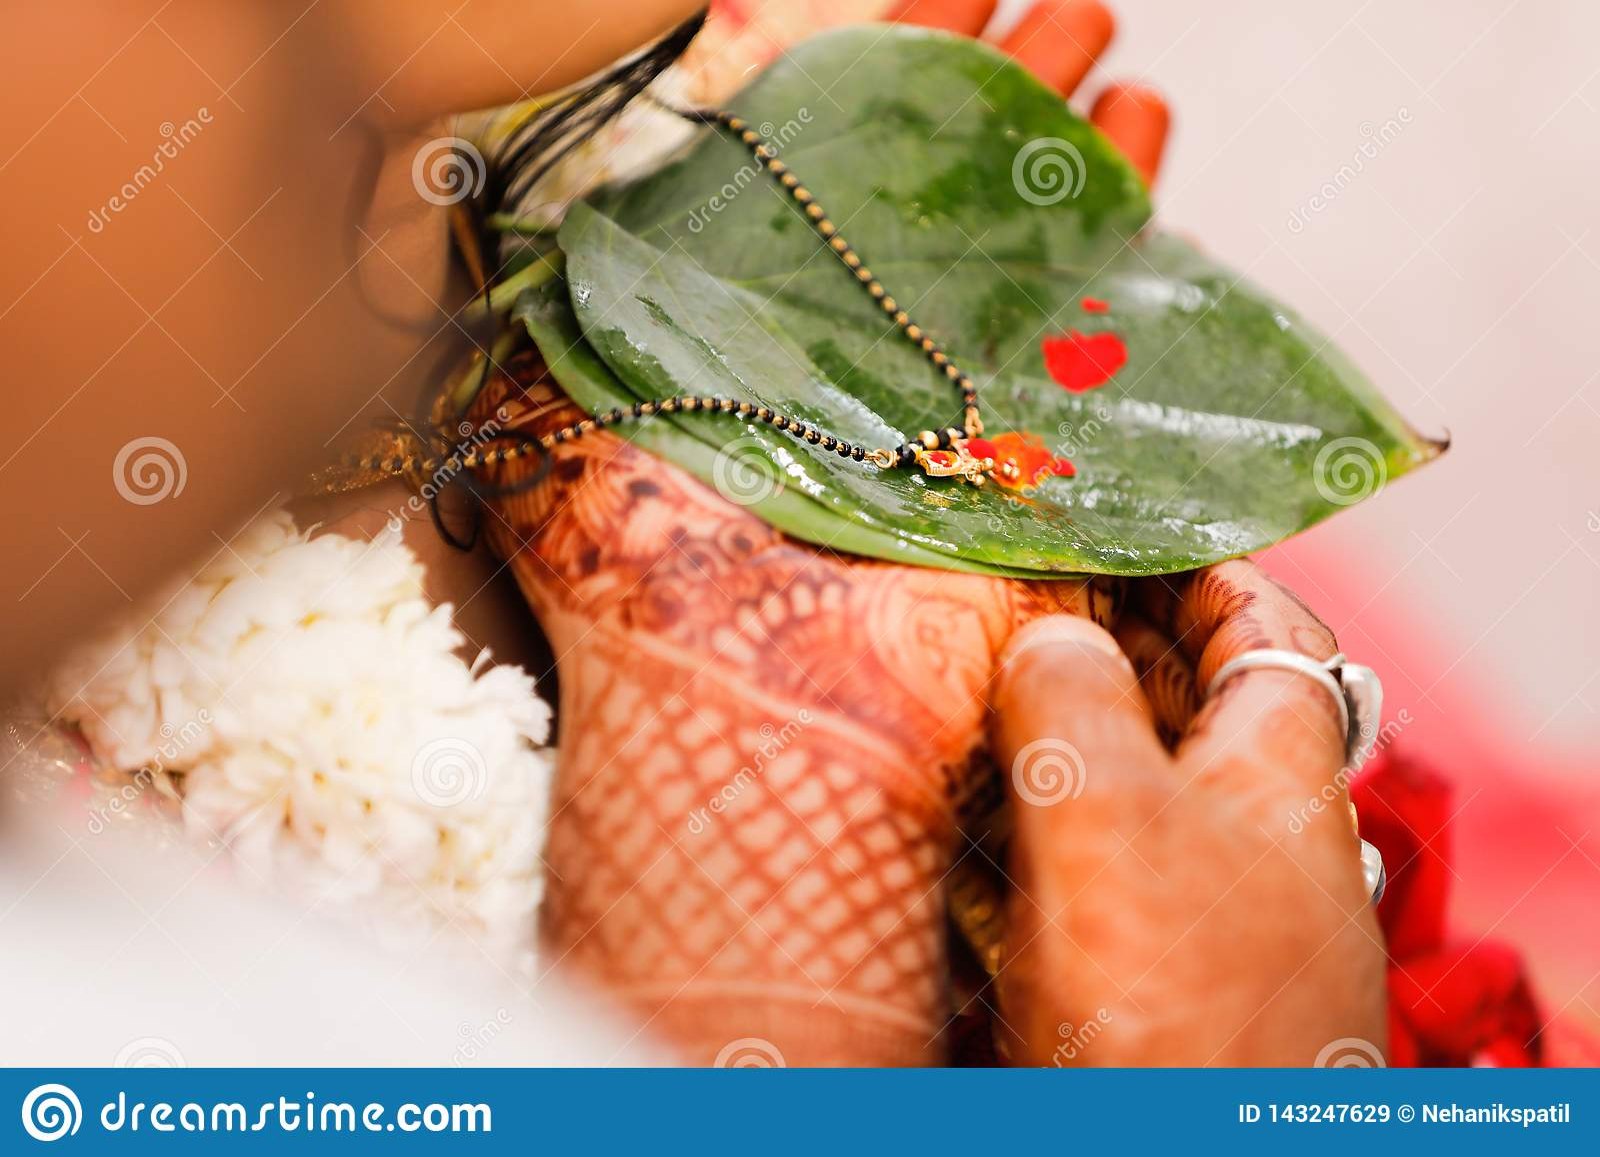 Indian wedding, mangalsutra ceremony